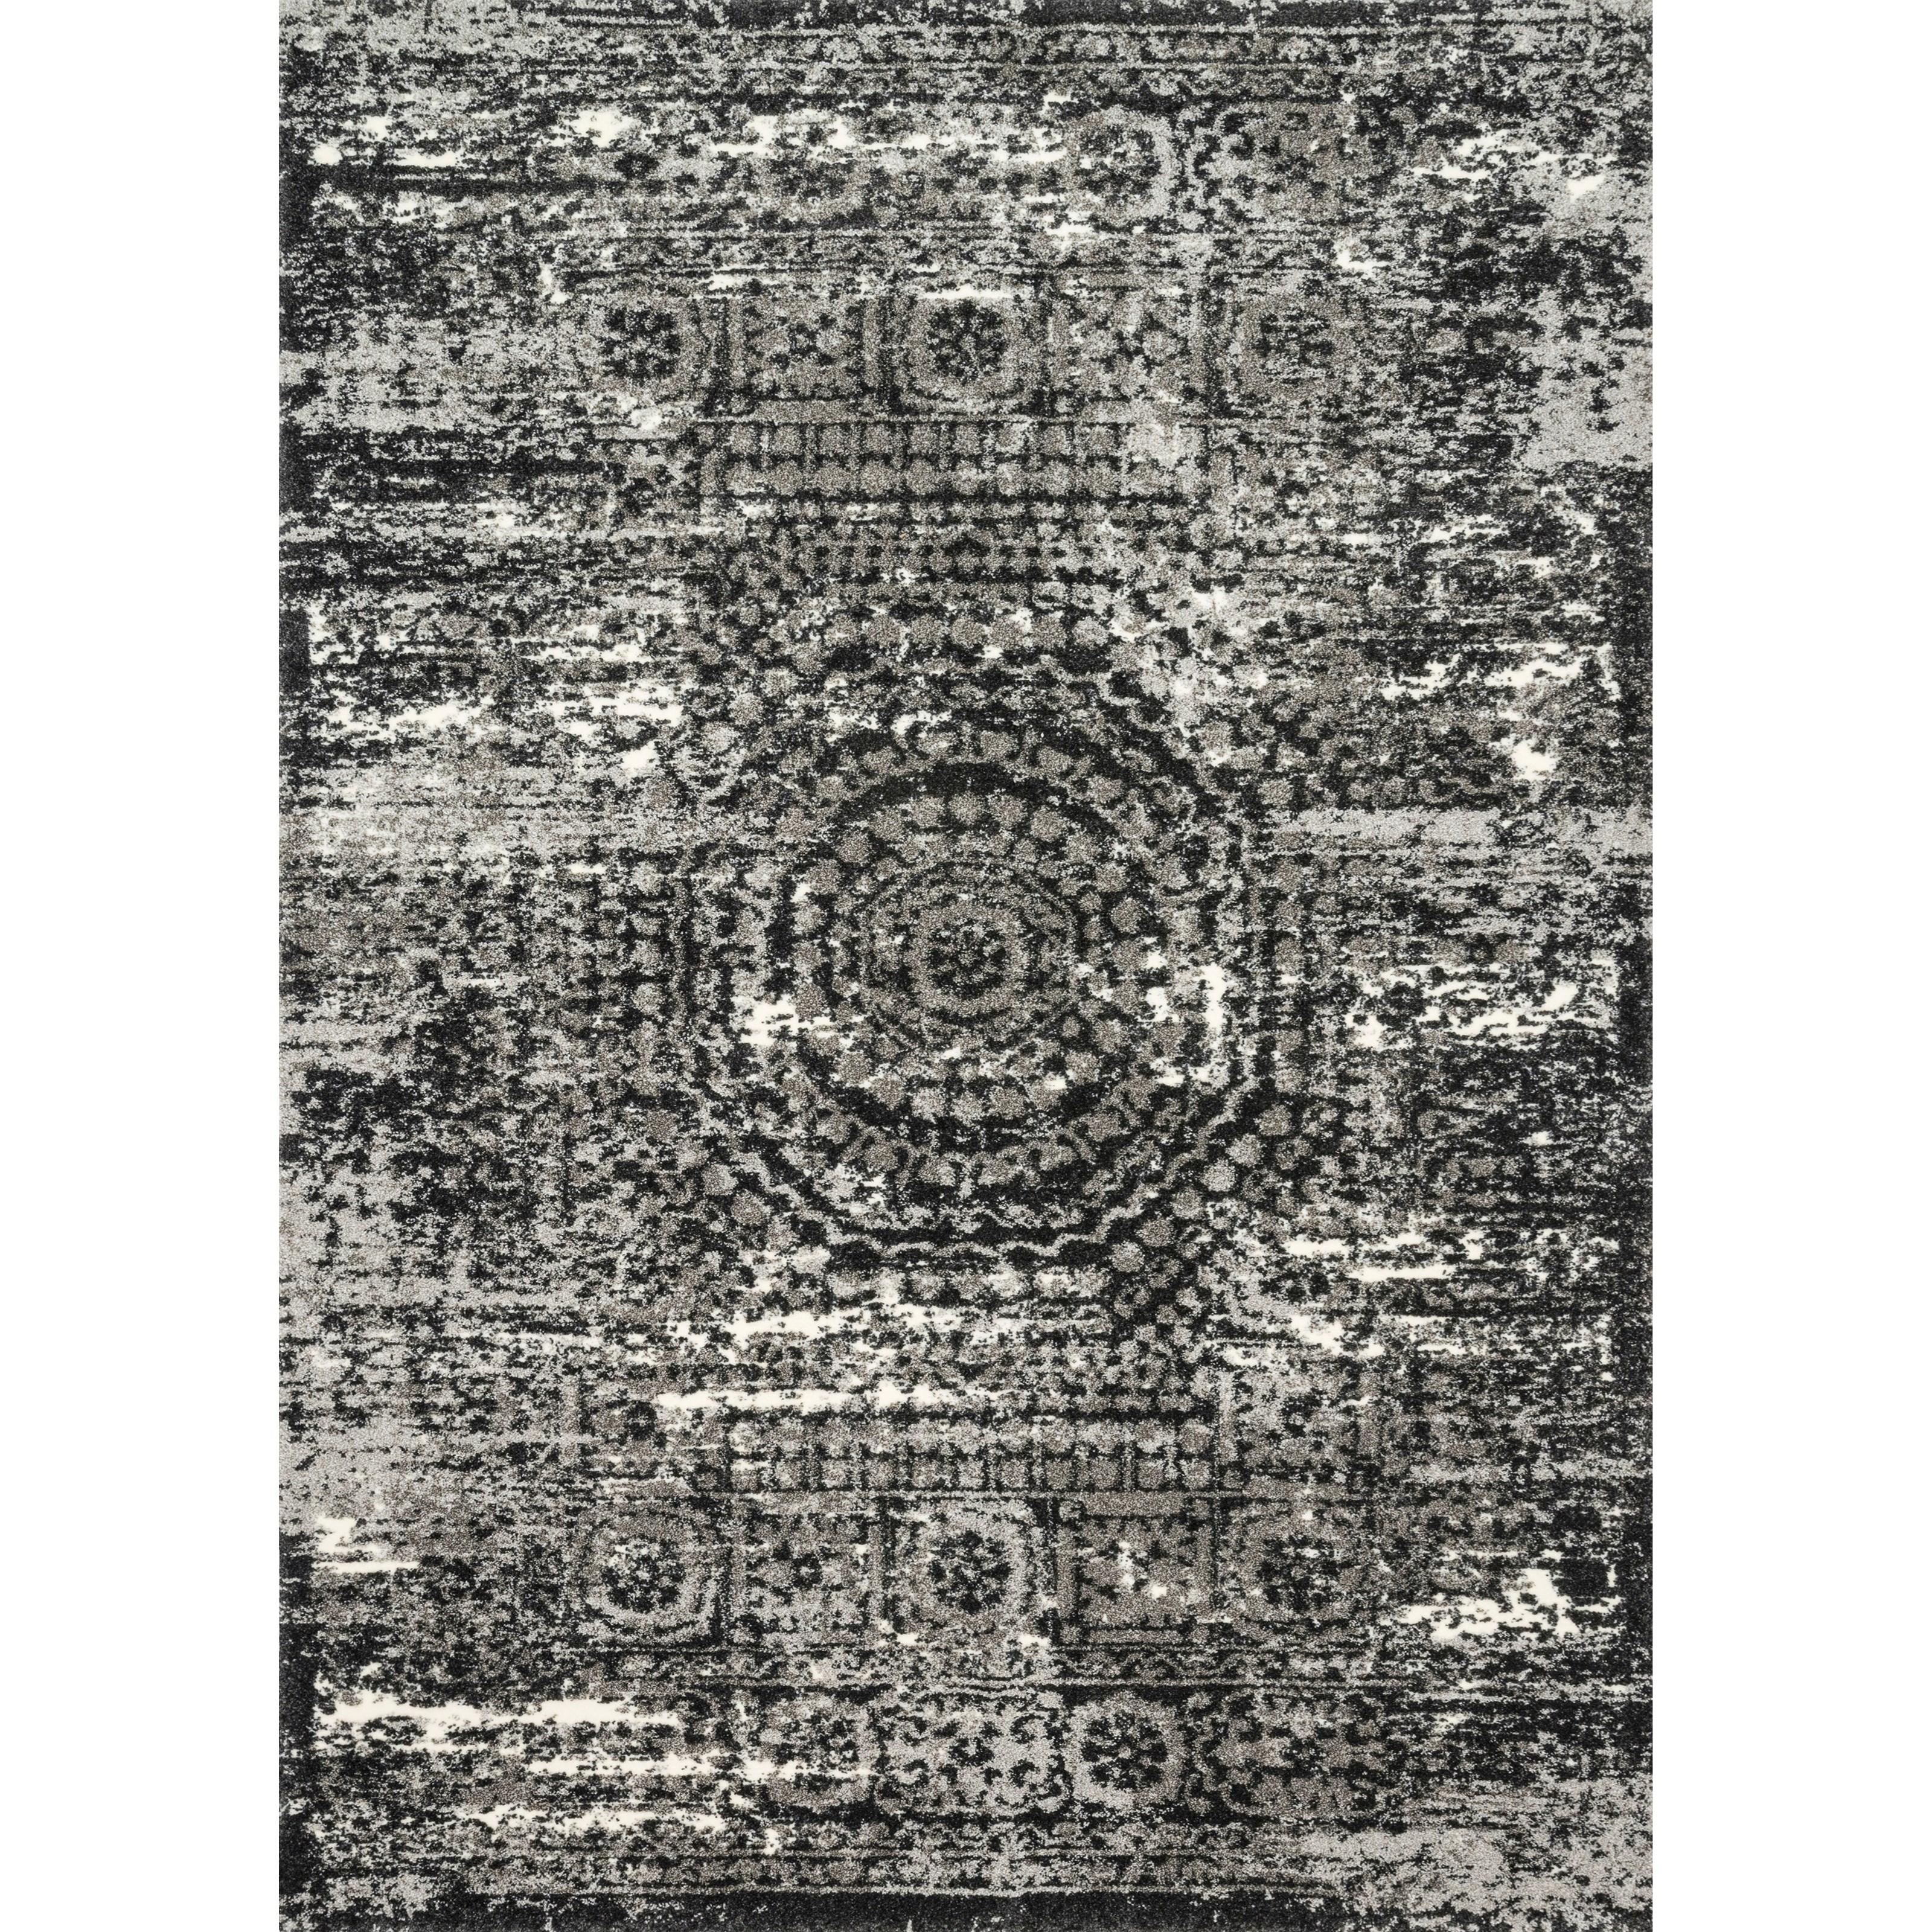 "Viera 8'11"" x 12'5"" Graphite / Black Rug by Loloi Rugs at Virginia Furniture Market"